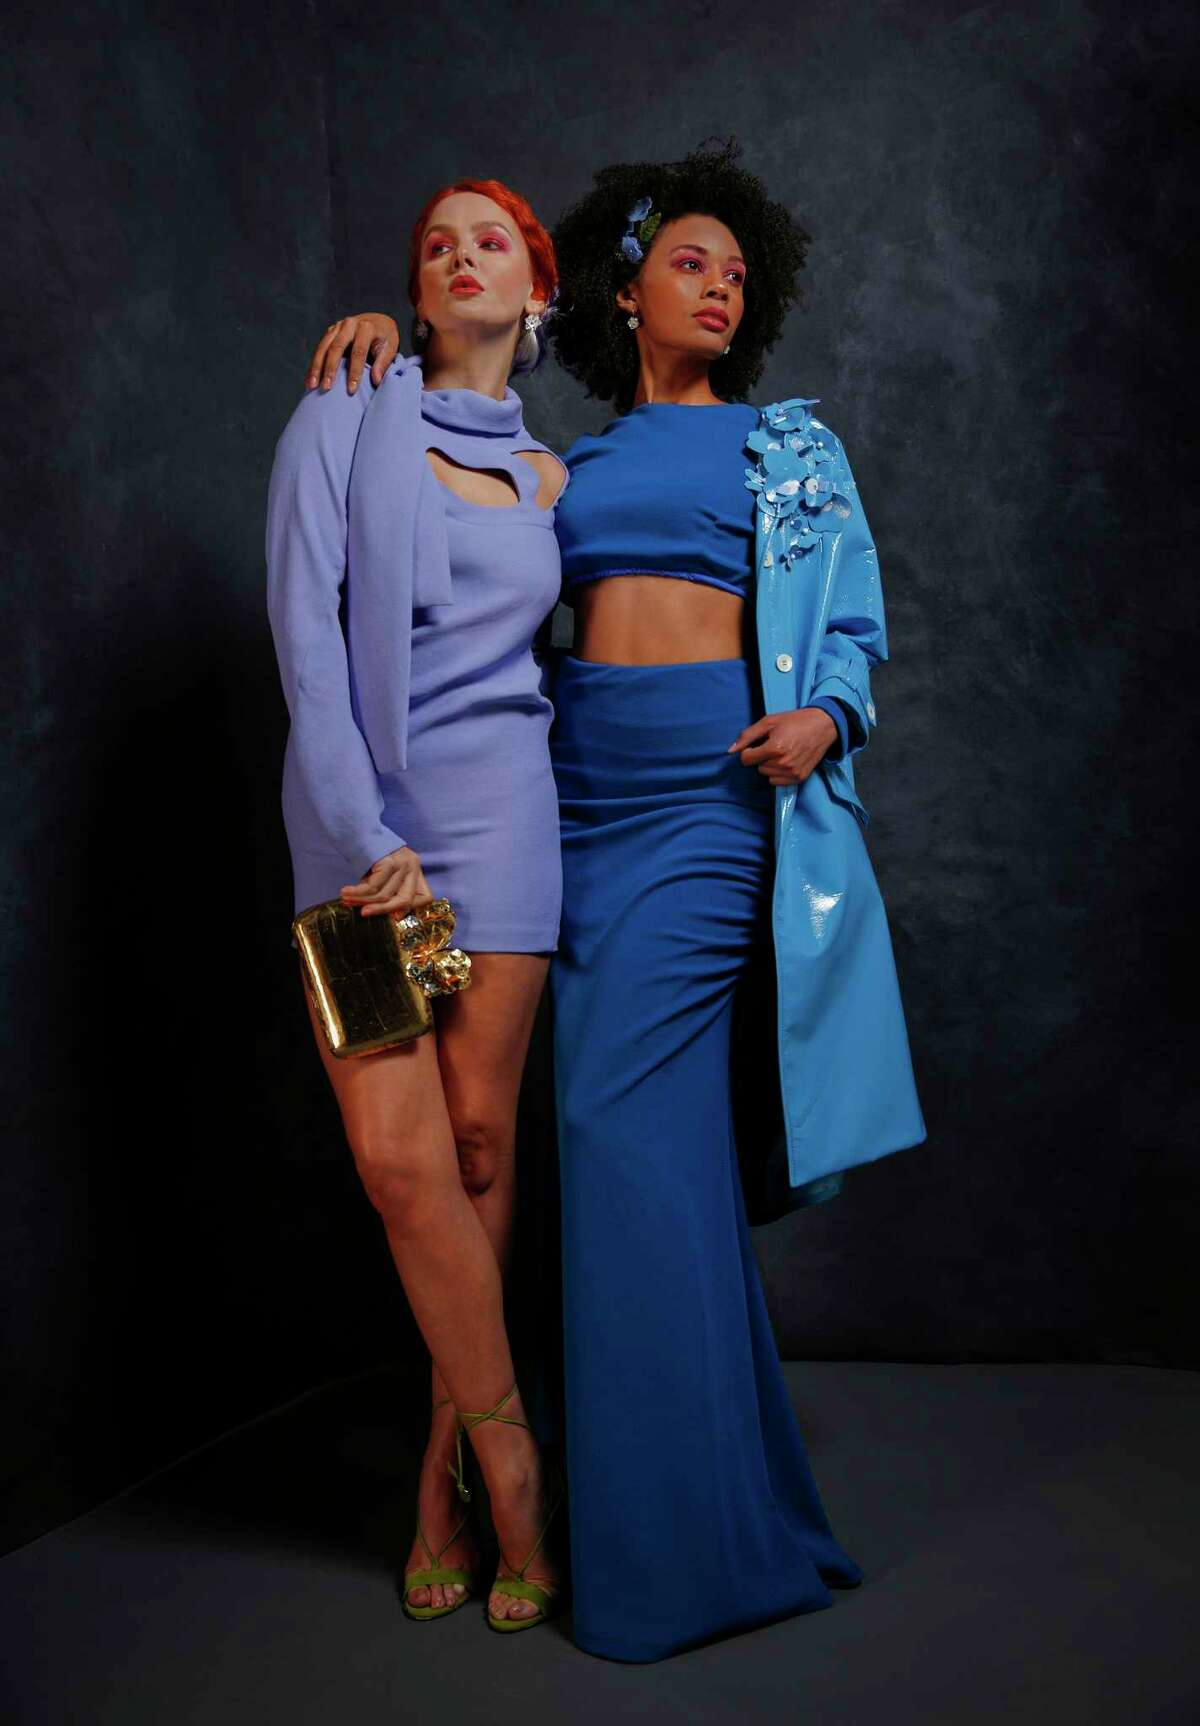 Hydrangea: Miu Miu raincoat, $3,345, Saks Fifth Avenue. Lilac: Celine tunic, $2,350, Saks Fifth Avenue. Nancy Gonzales butterfly clutch, $2,750, Saks Fifth Avenue.